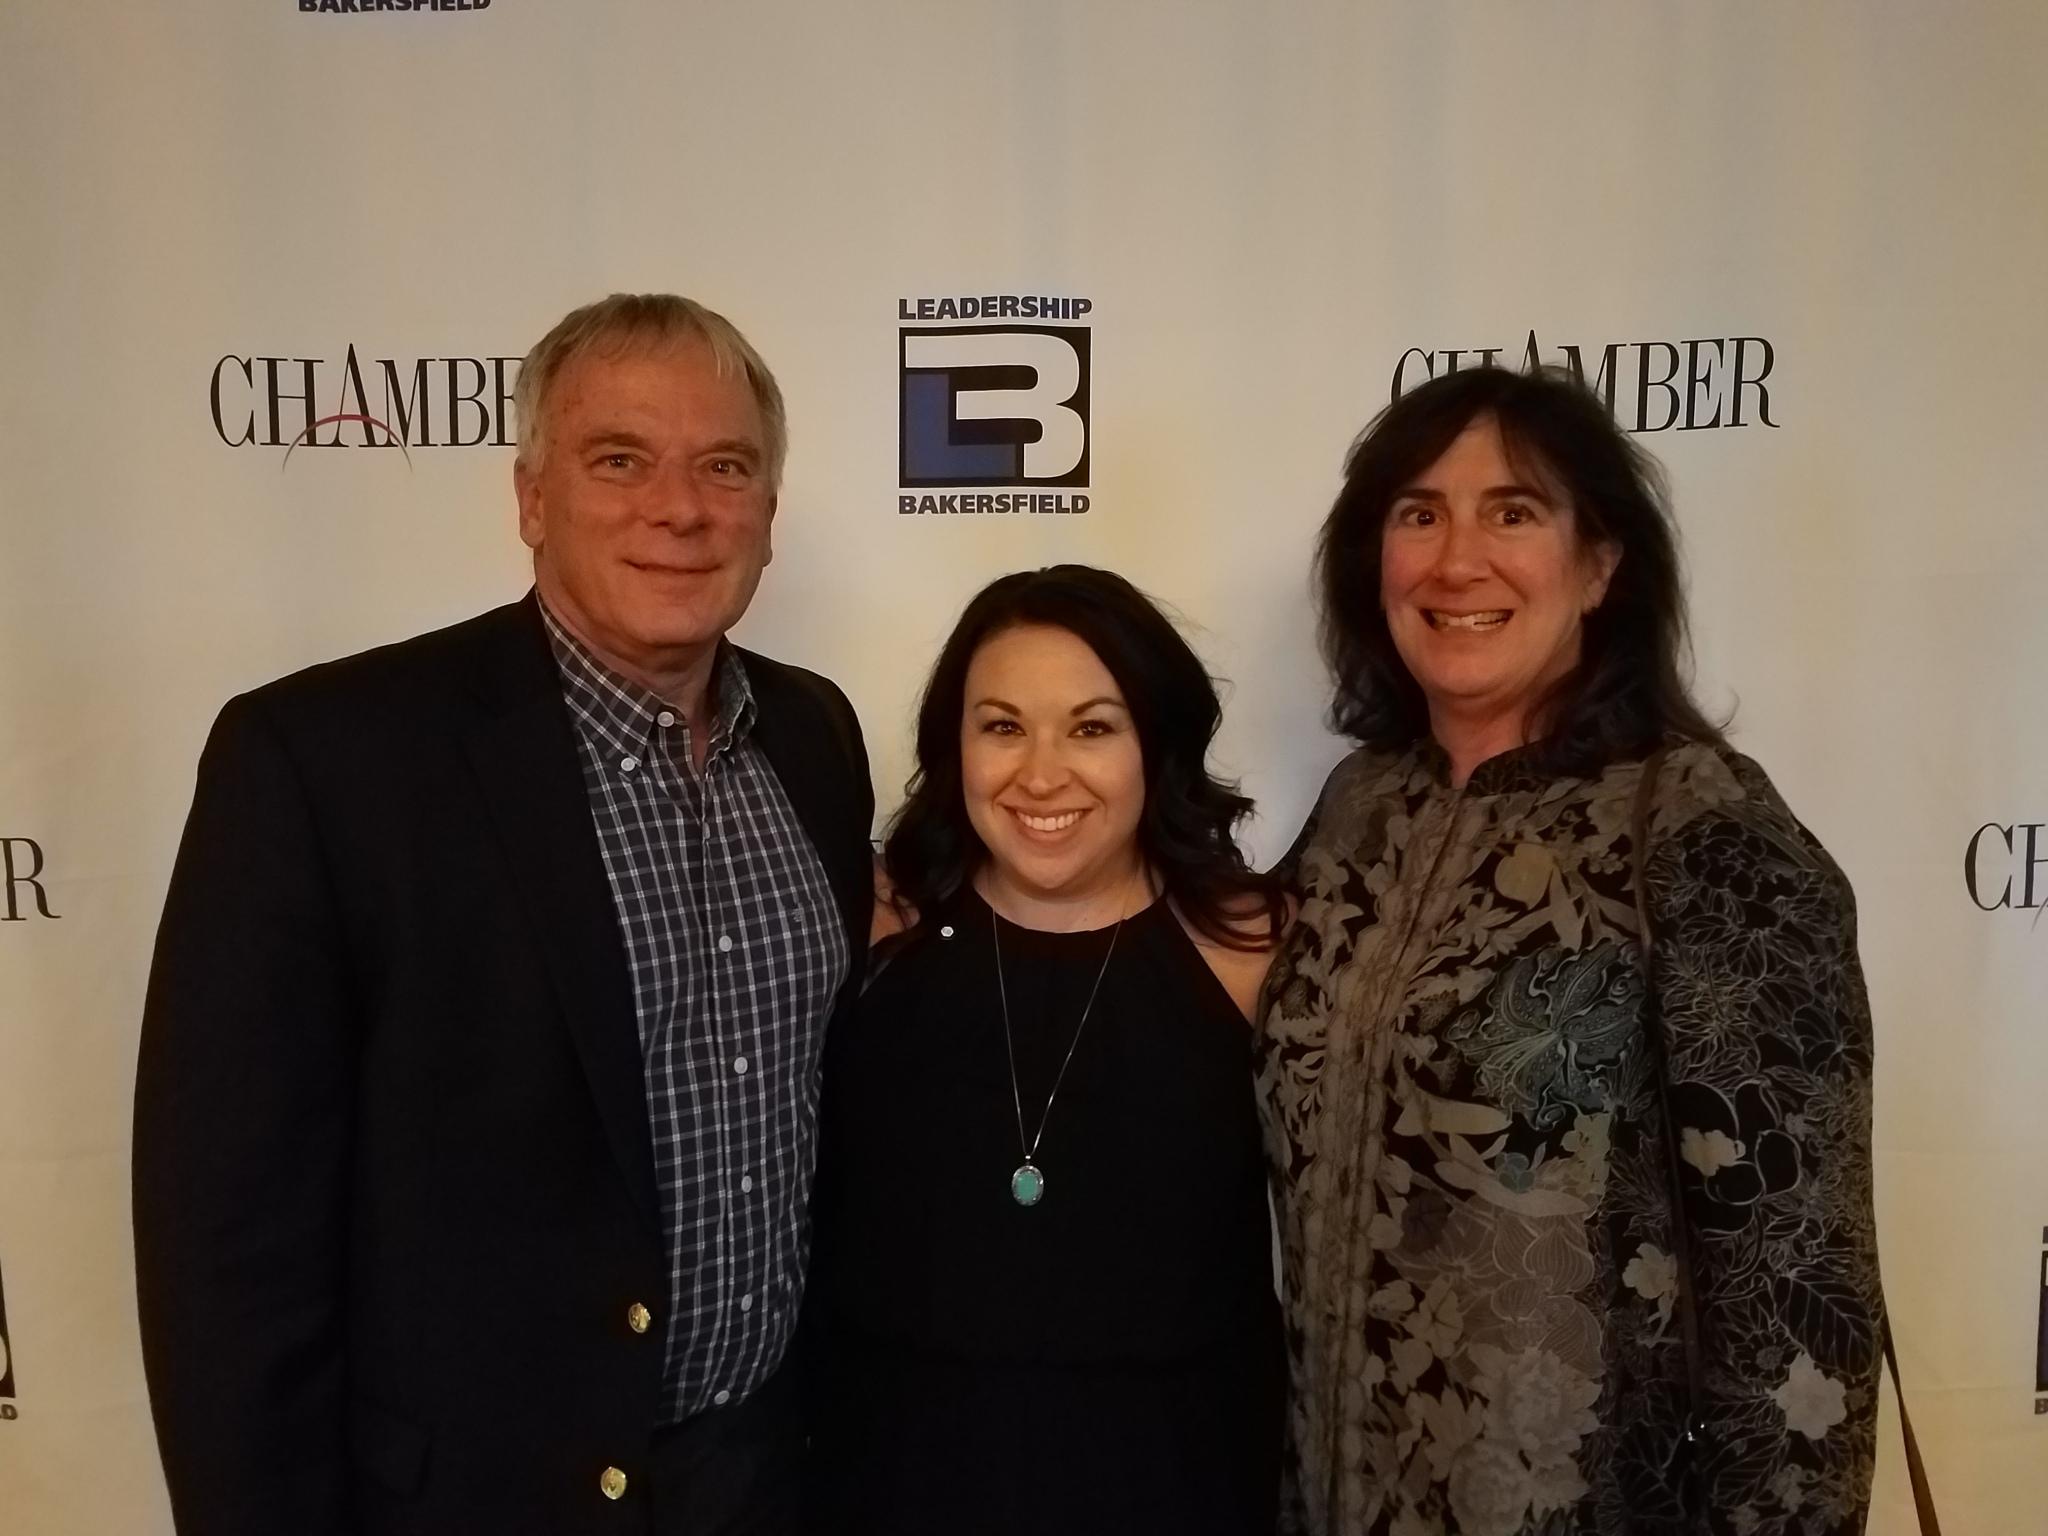 Heather Penella June 2018 with Tom Gelder and Dana Gelder